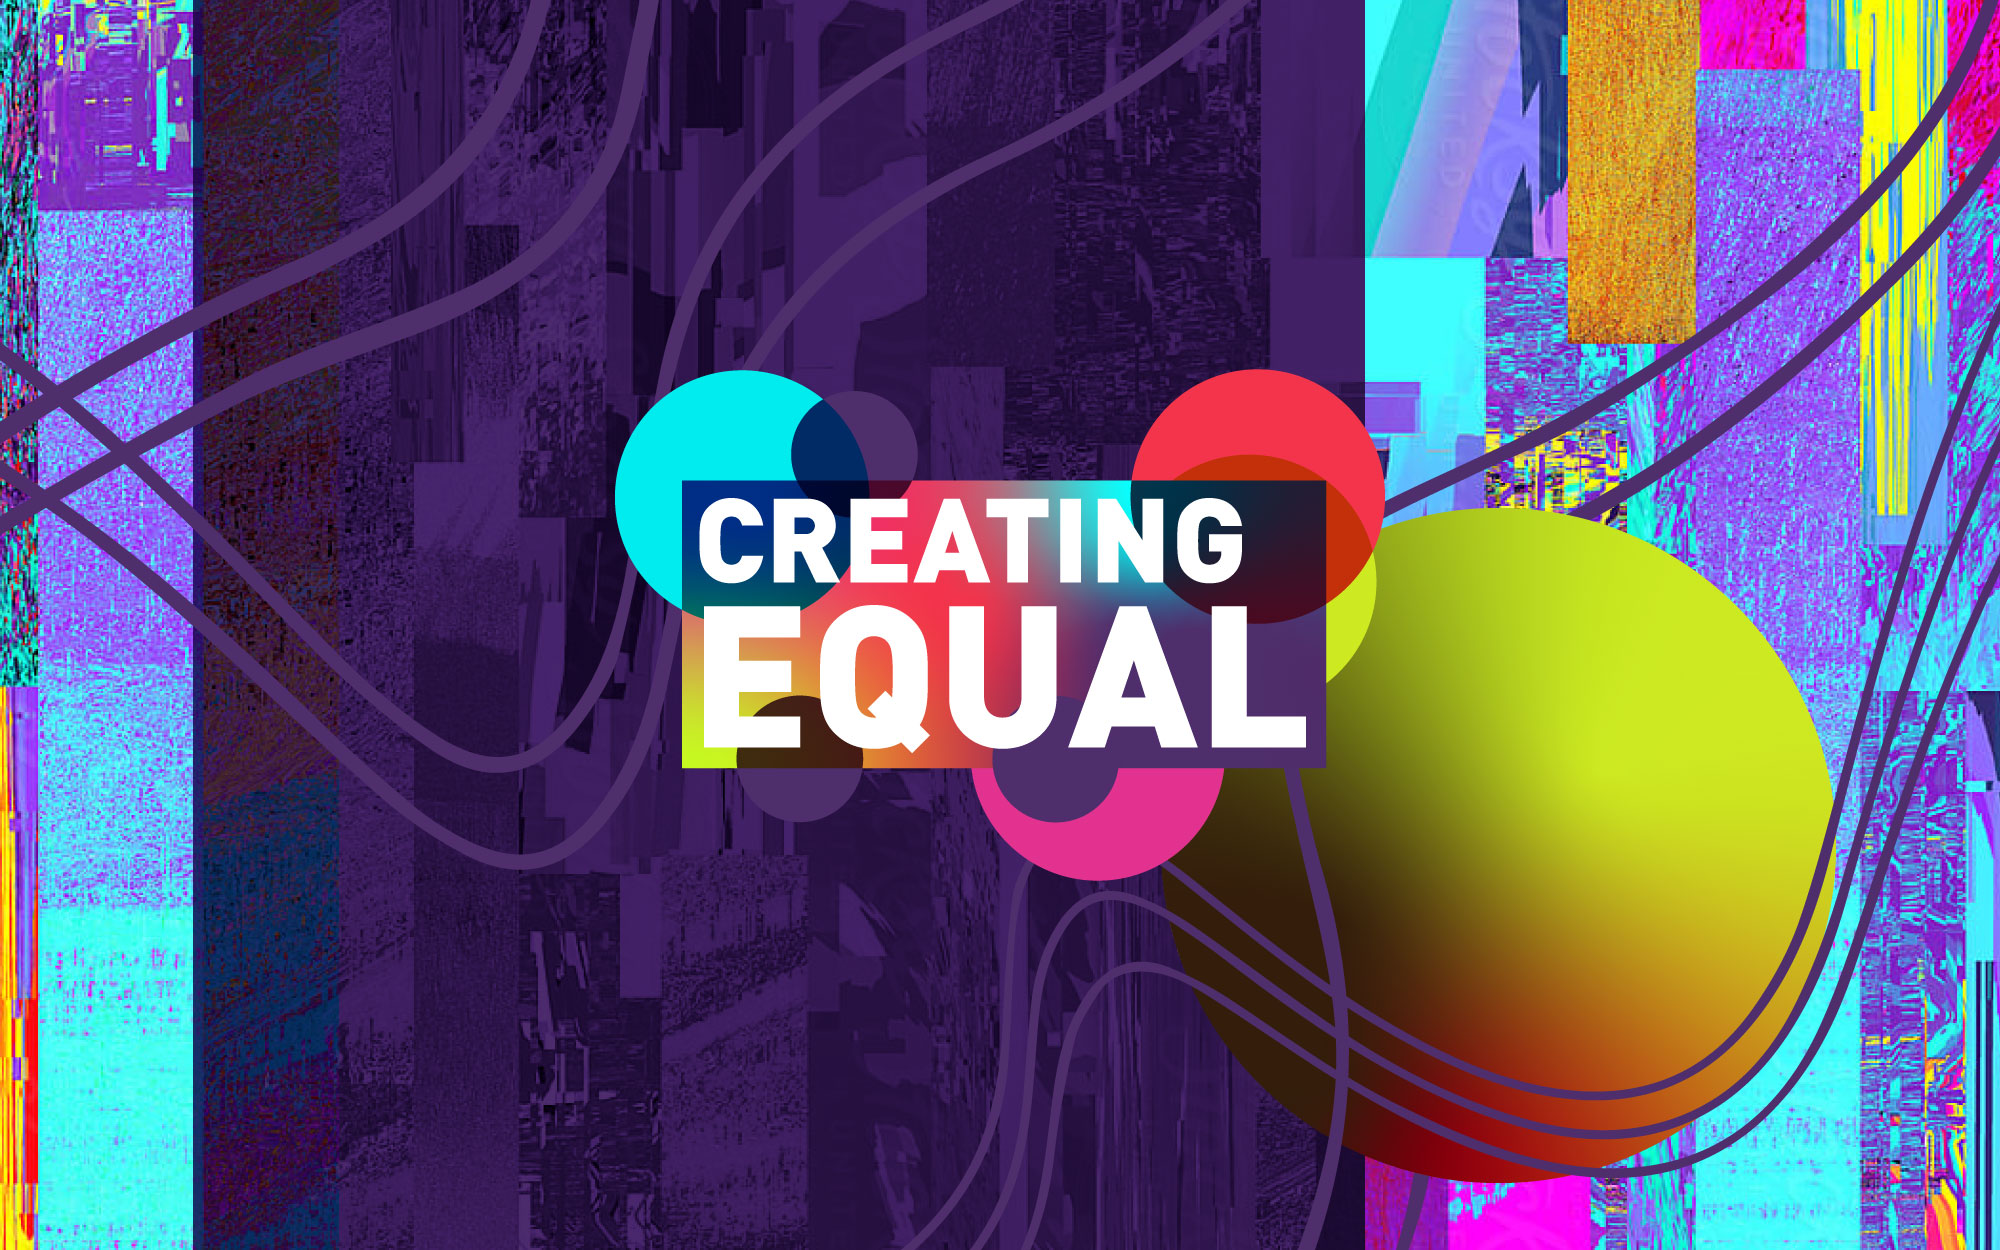 Creating Equal